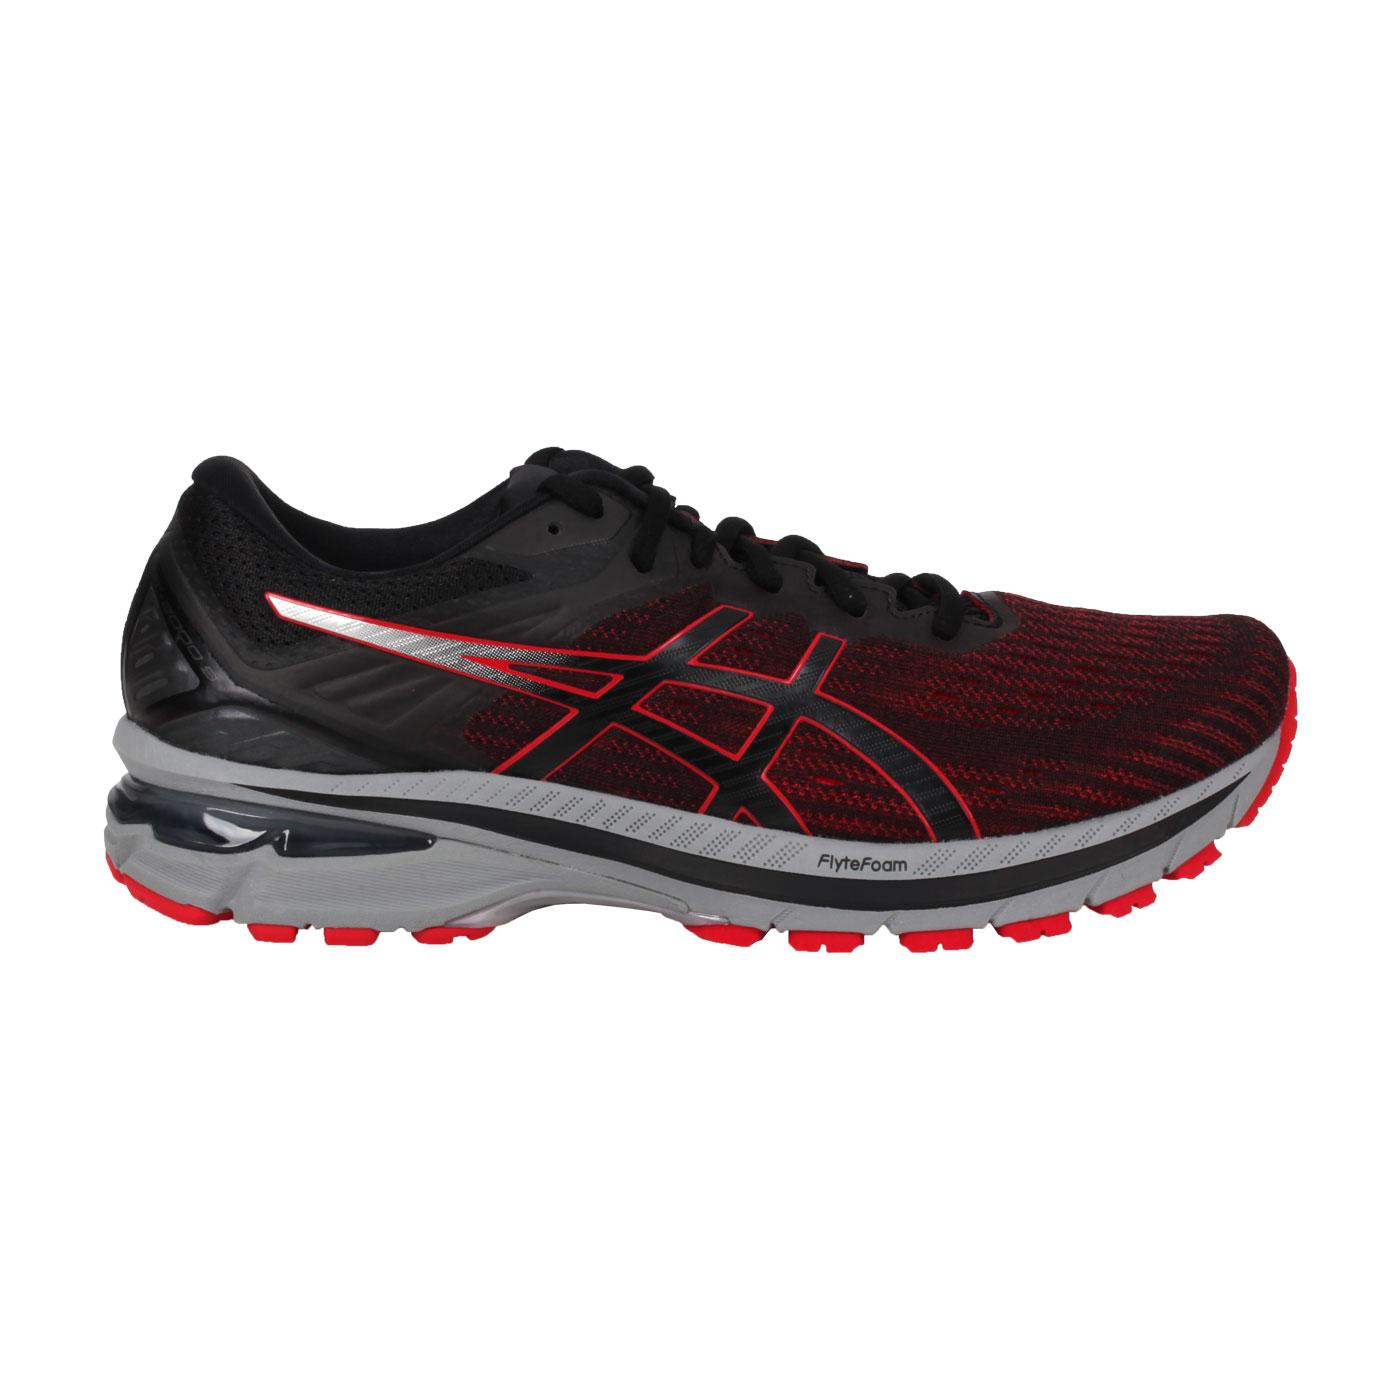 ASICS 男款慢跑鞋  @GT-2000 9@1011A983-005 - 黑紅灰